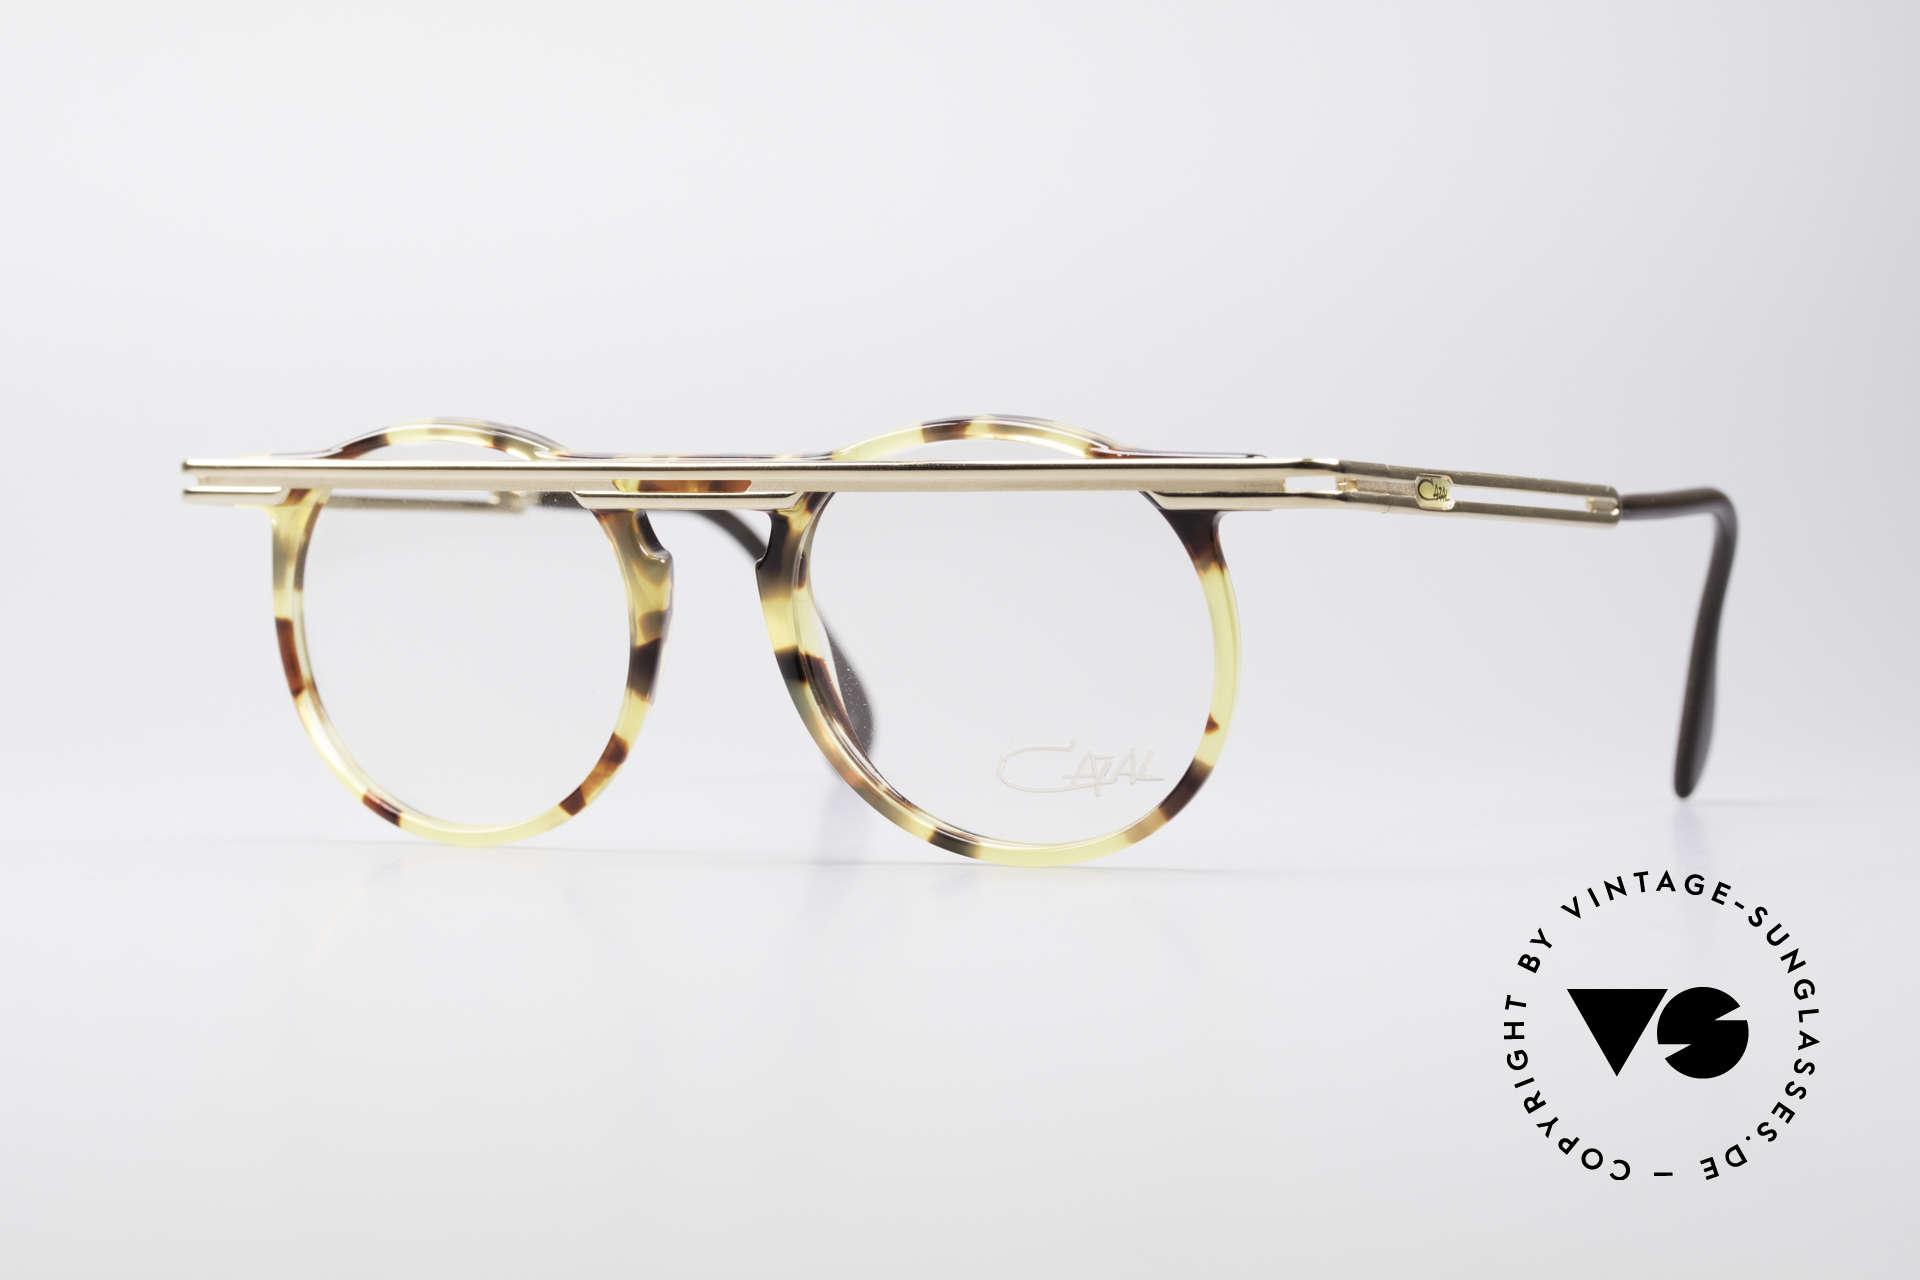 Cazal 648 True 90's Cari Zalloni Glasses, extraordinary CAZAL vintage eyeglasses from 1990, Made for Men and Women